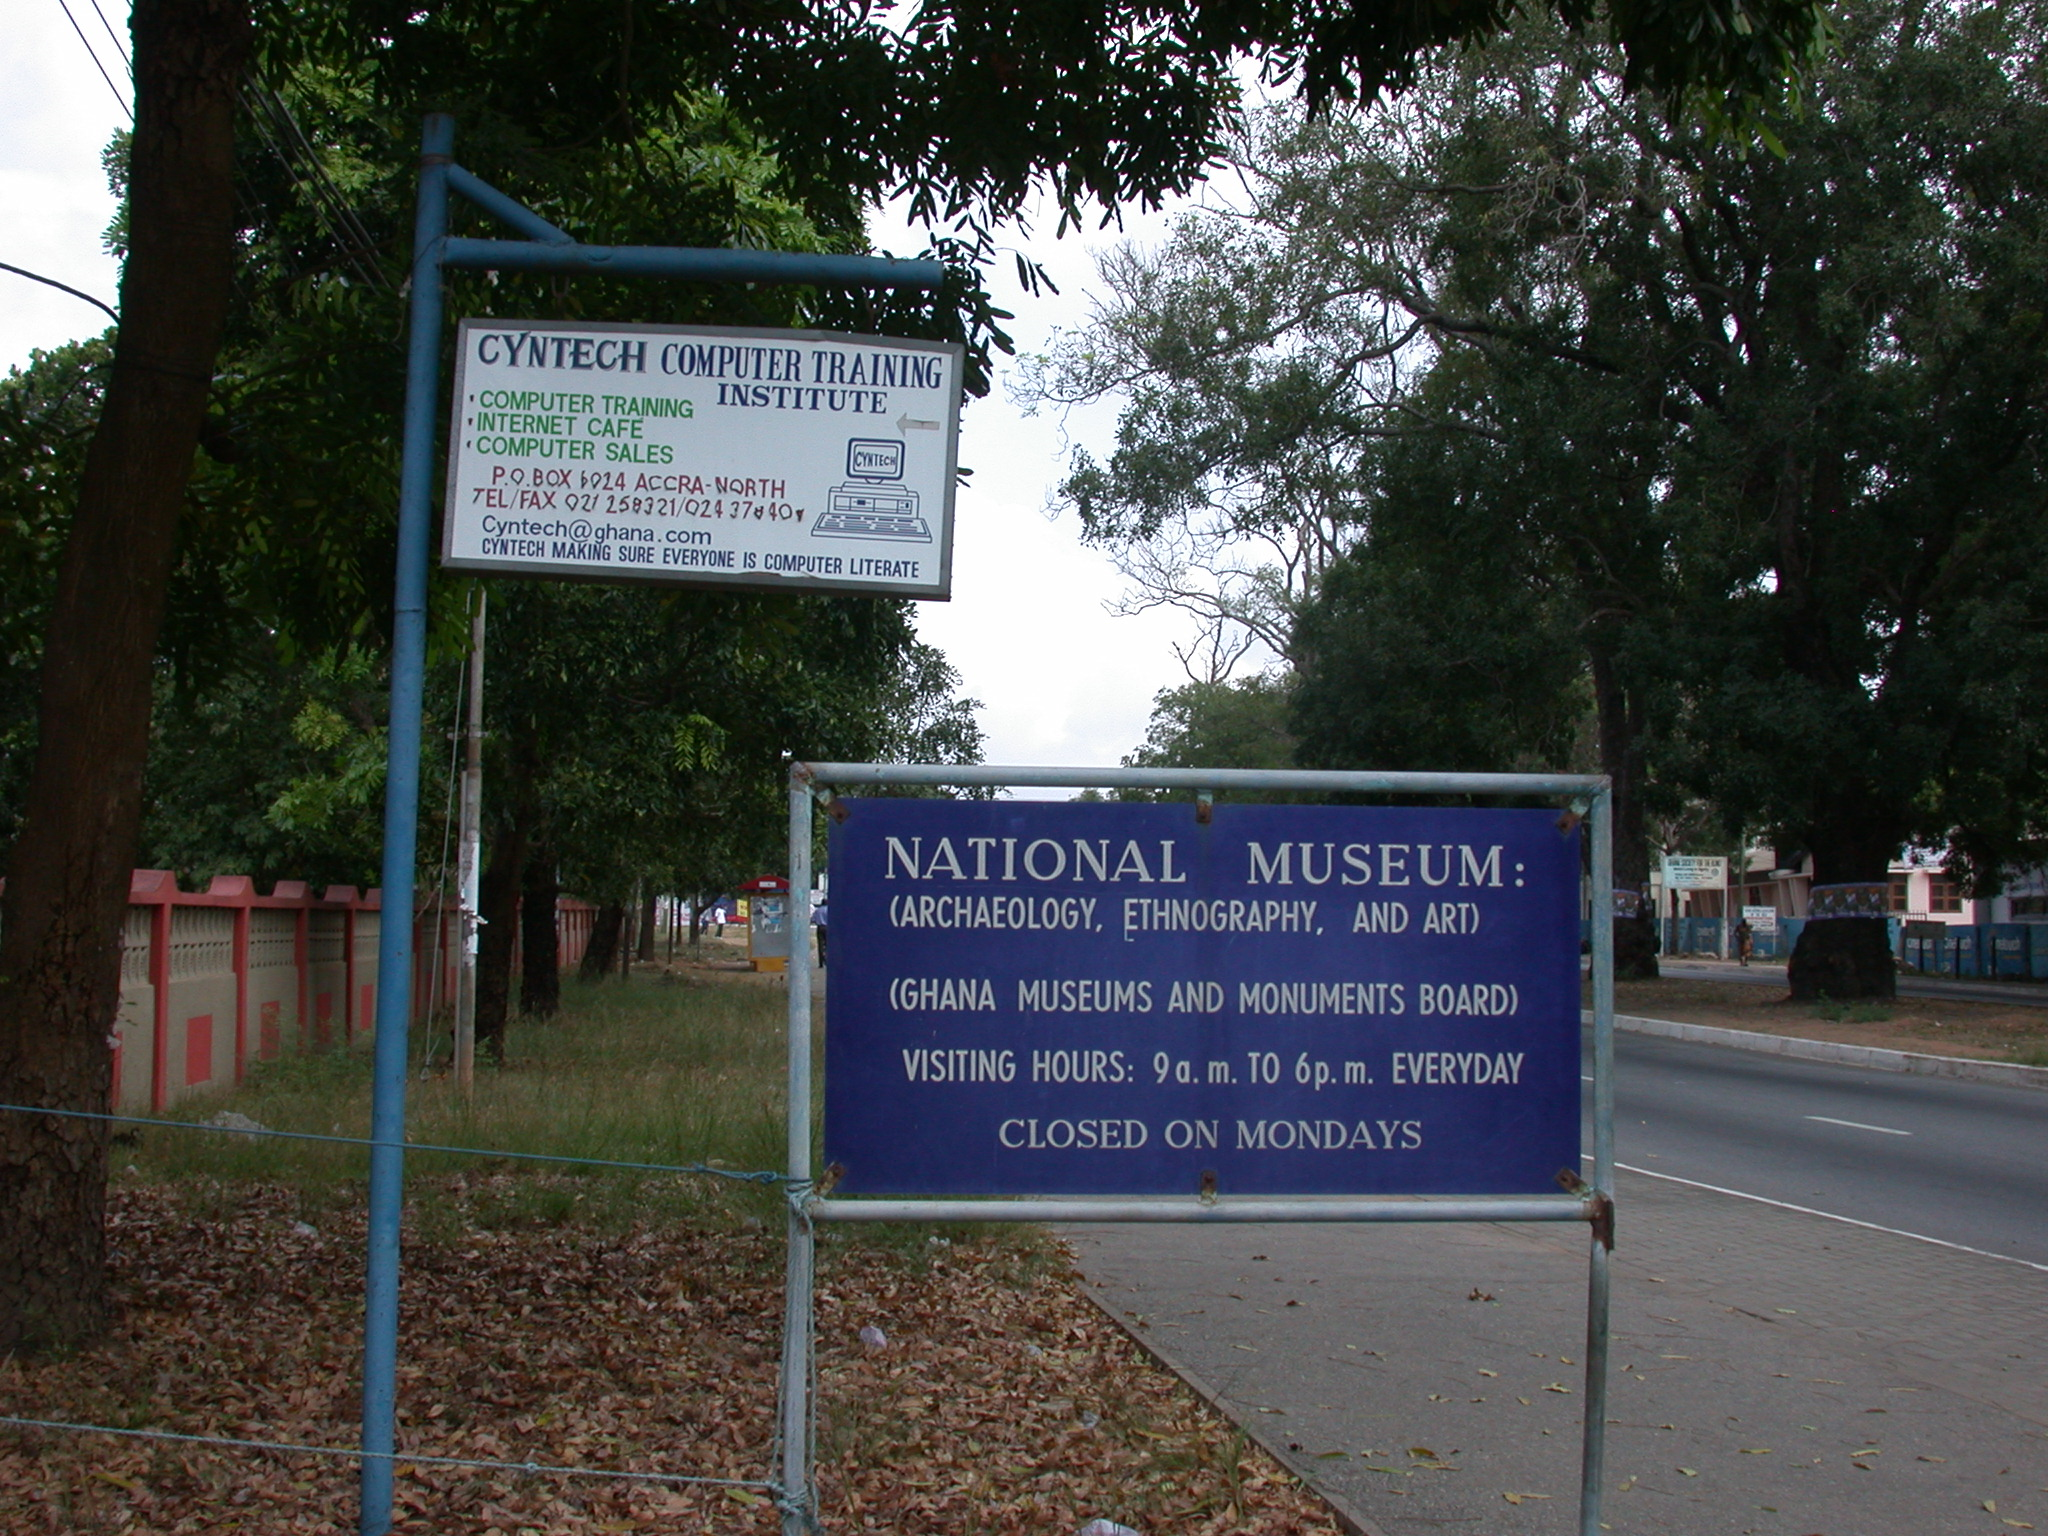 National Museum, Accra, Ghana